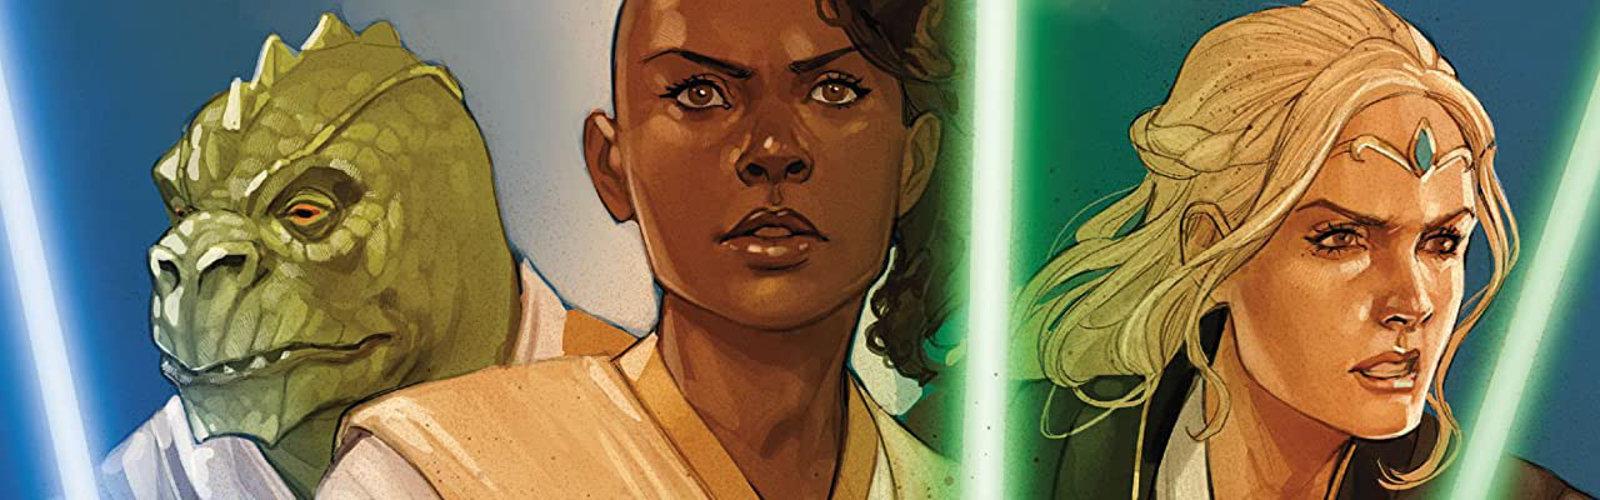 Star Wars: The High Republic (2021-) #1